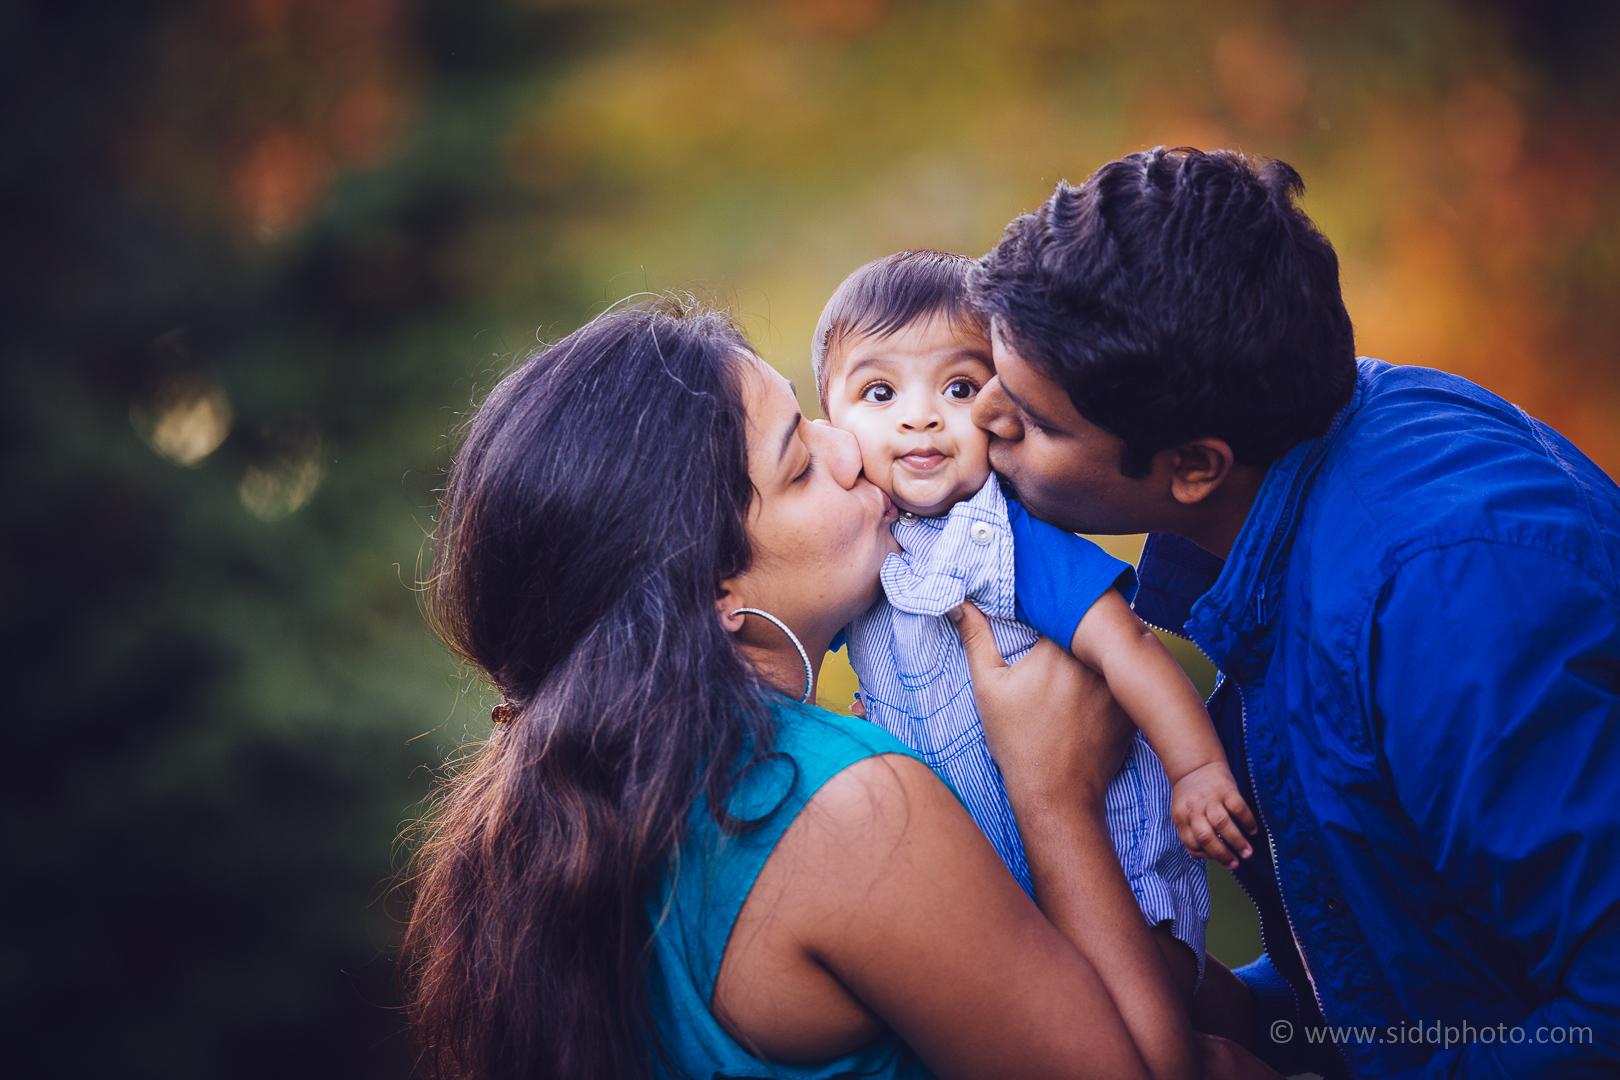 2014-10-18 - Deepthi Parthu Family - _O5C6003